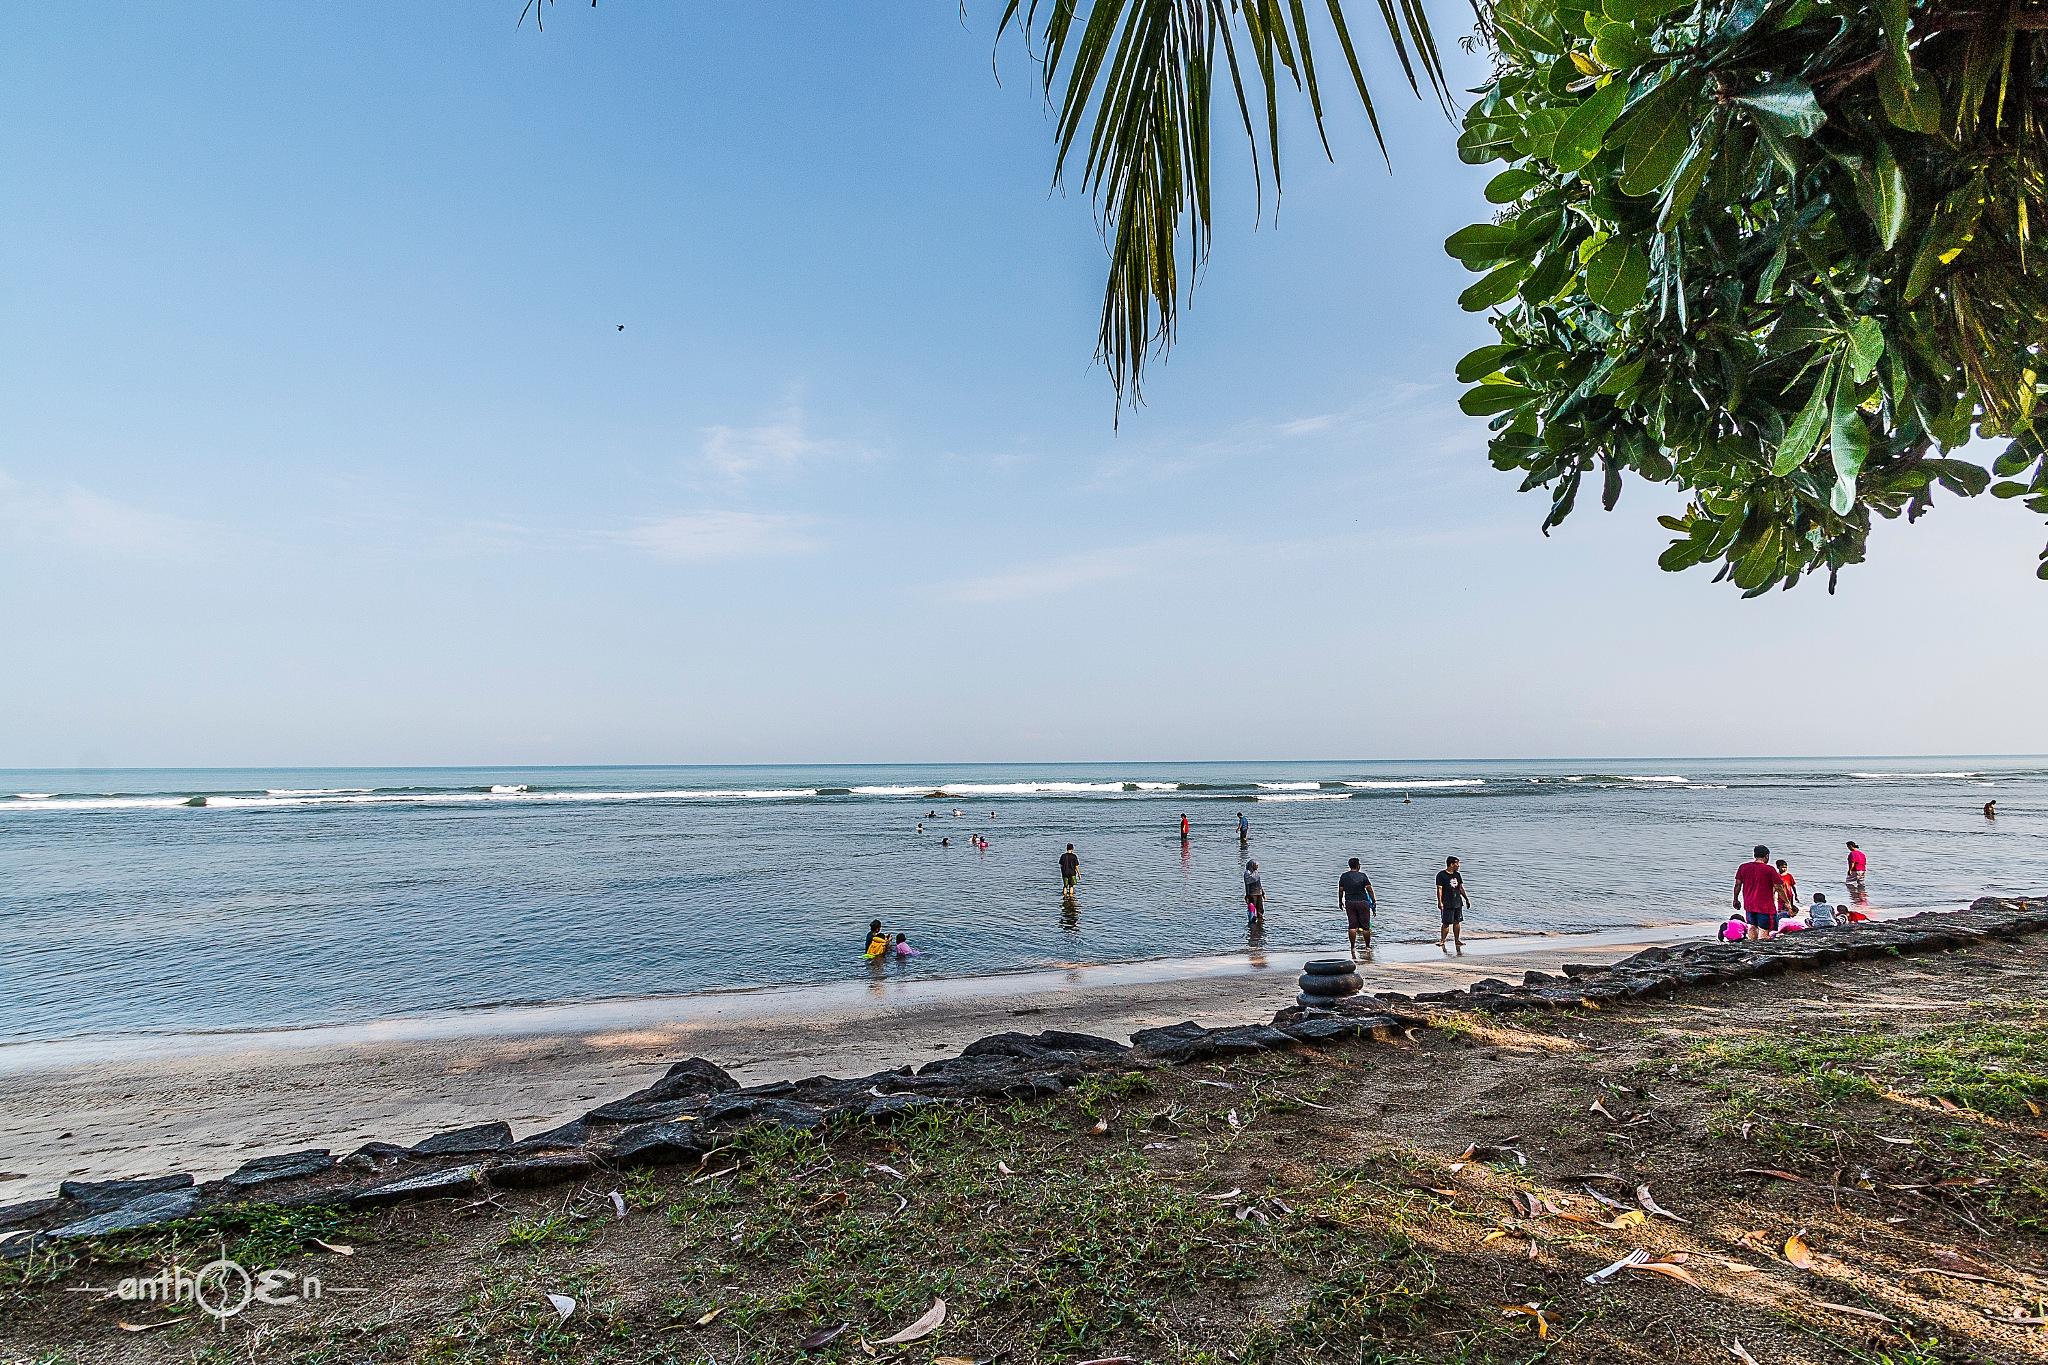 Get on the Beach by Anthoen Luciferano Karnanta